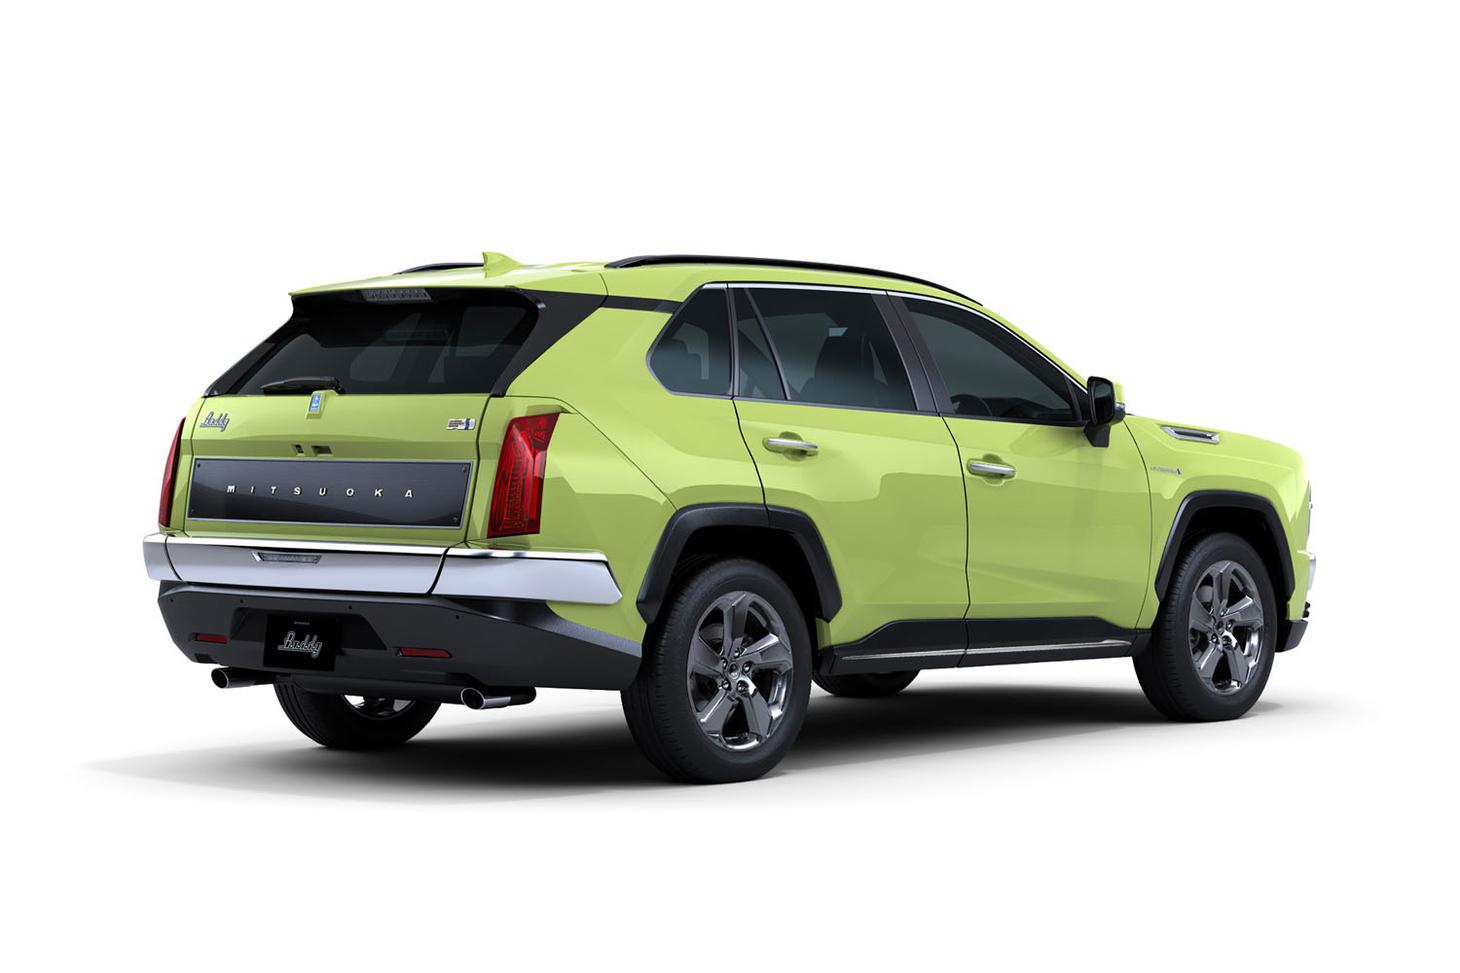 2019 - [Toyota] RAV 4 V - Page 5 ElgvuDhW0AAOKhh?format=jpg&name=large